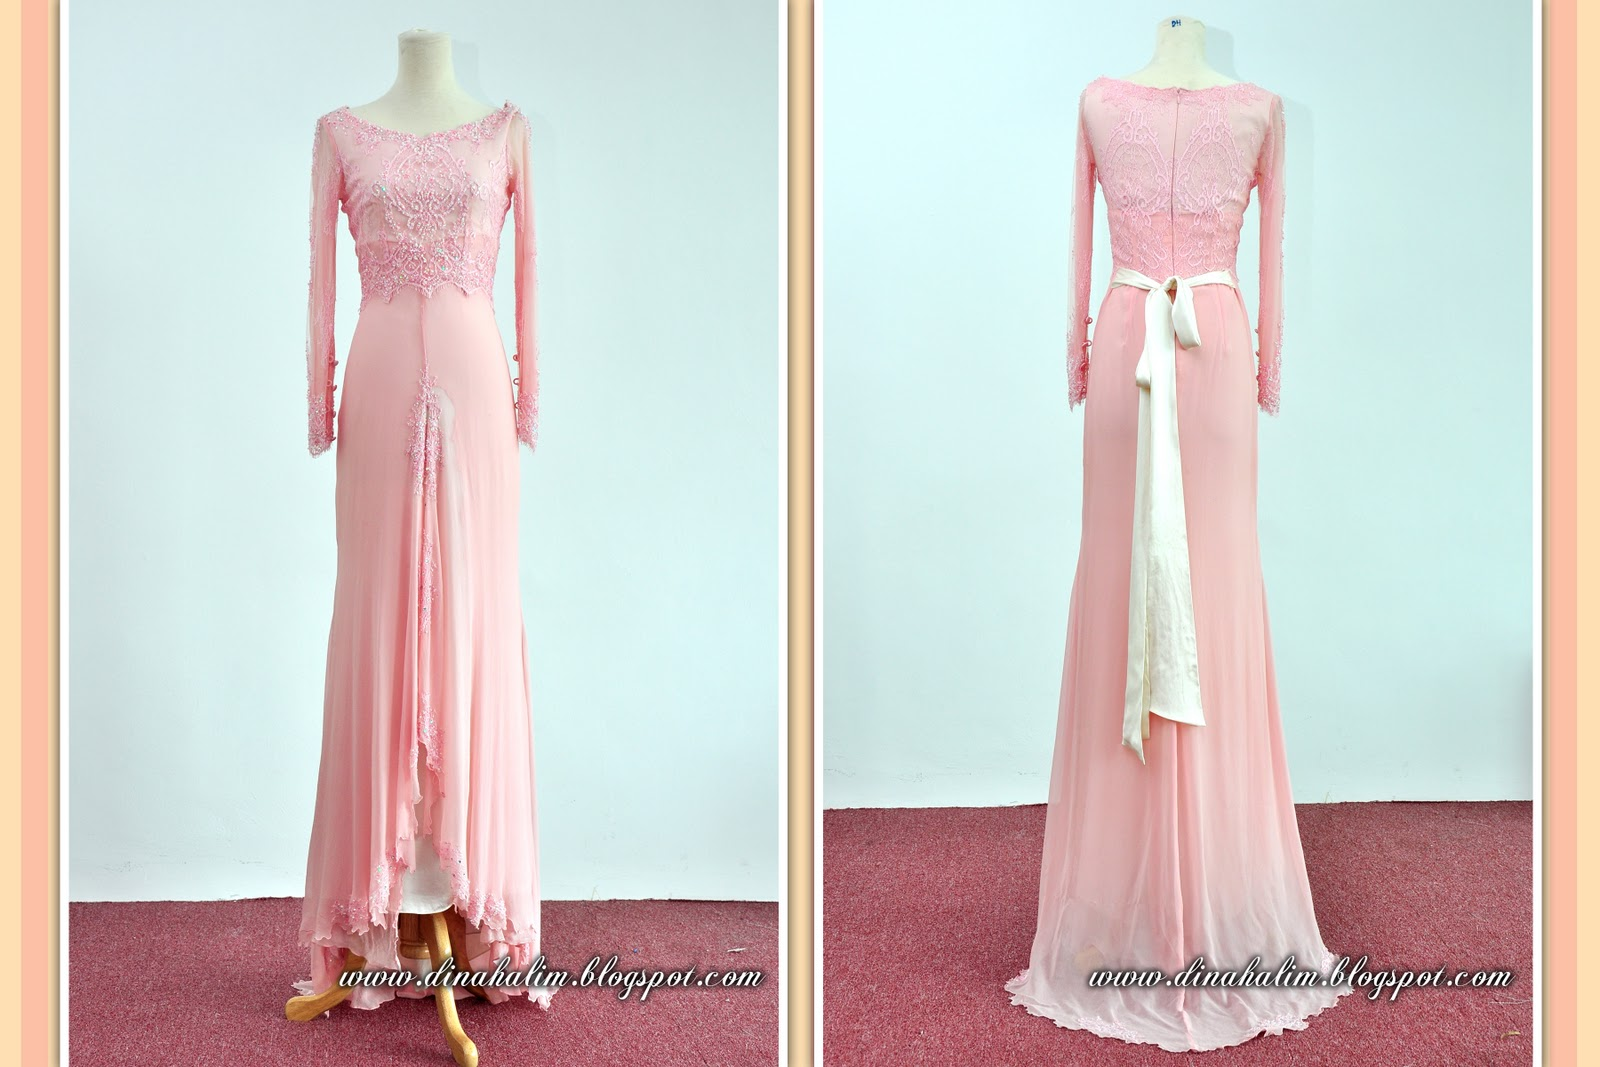 Dina Halim Bridal Boutique: Koleksi Baju by Dina Halim Bridal Boutique